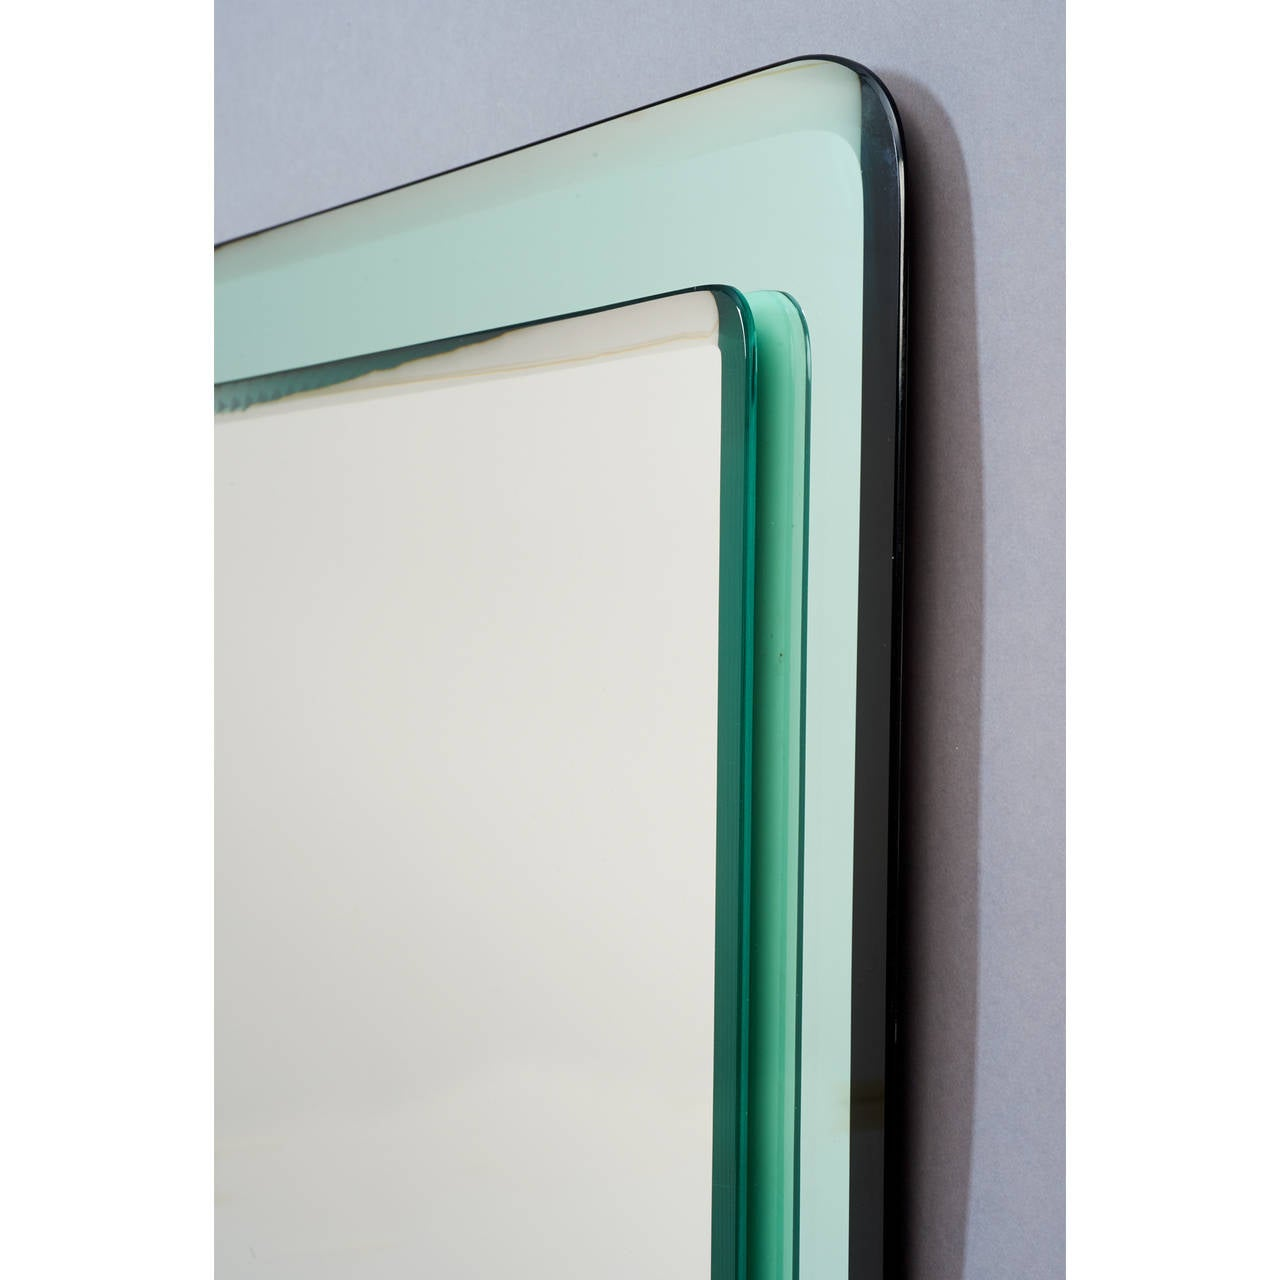 Mid-Century Modern Pair of Vert Nil Reverse Beveled Glass Mirror, Italy, 1970s